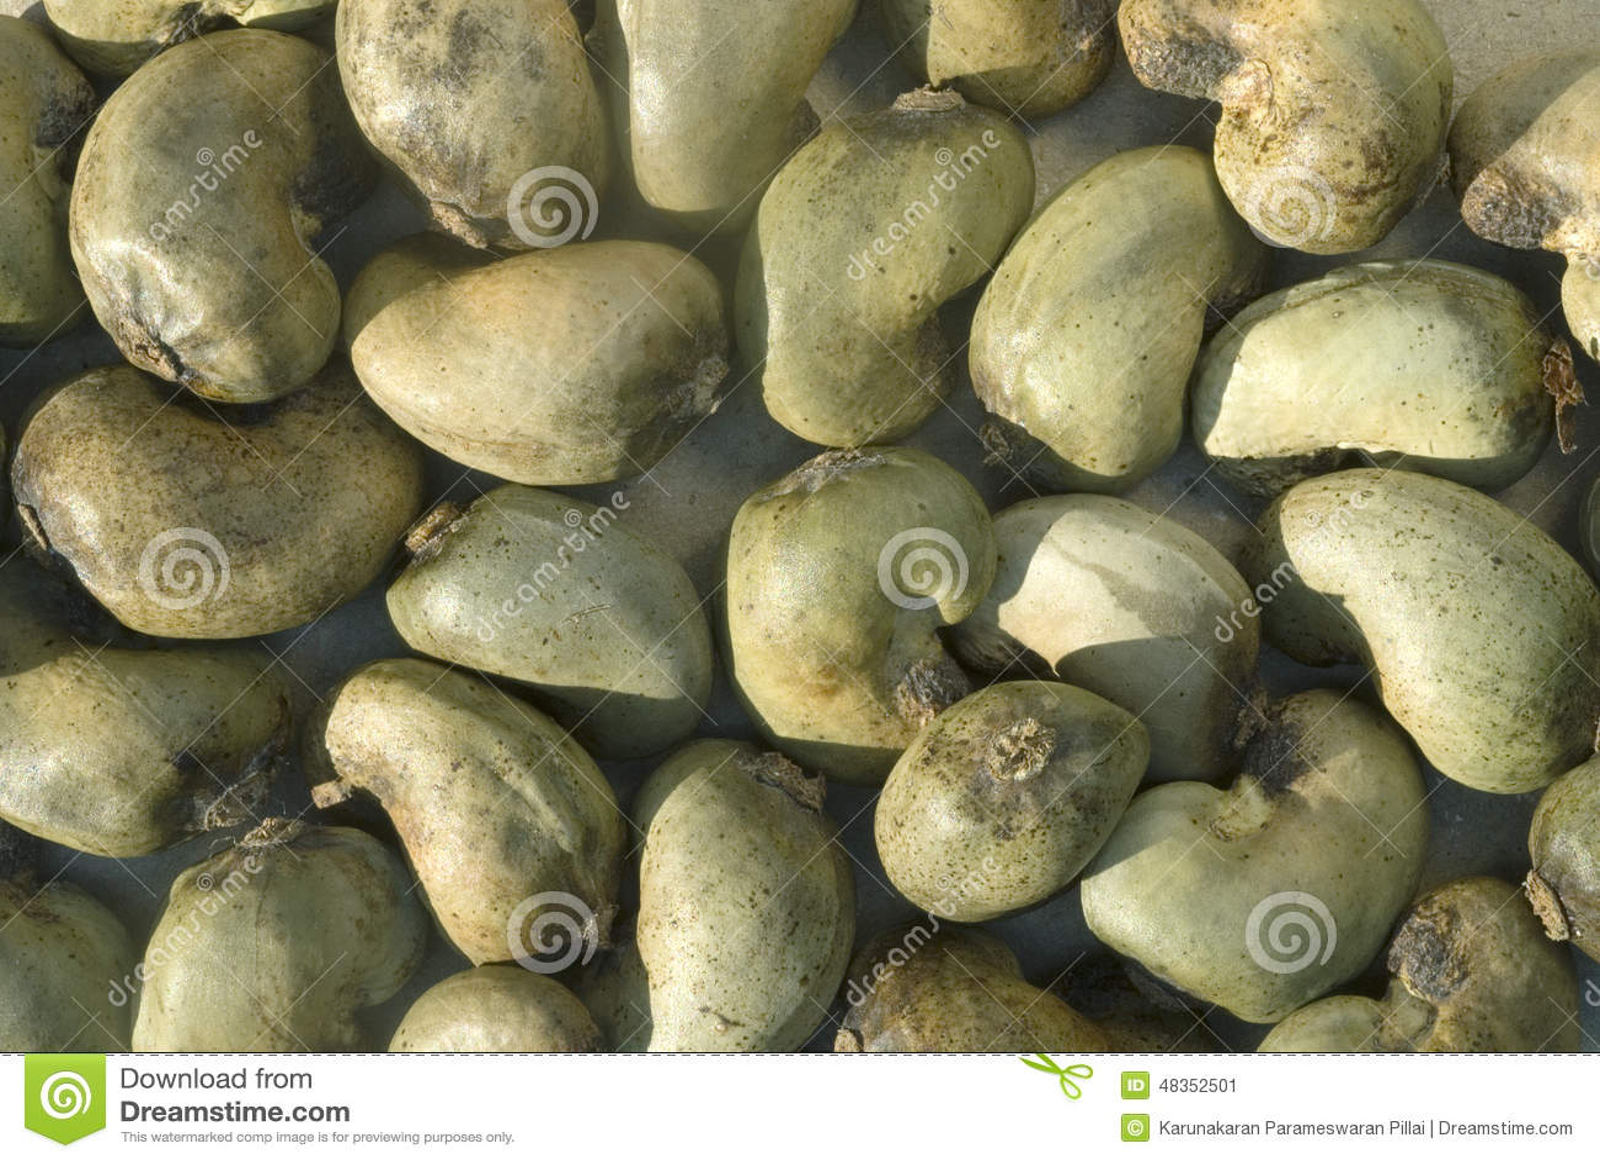 Rå cashewmuttrar